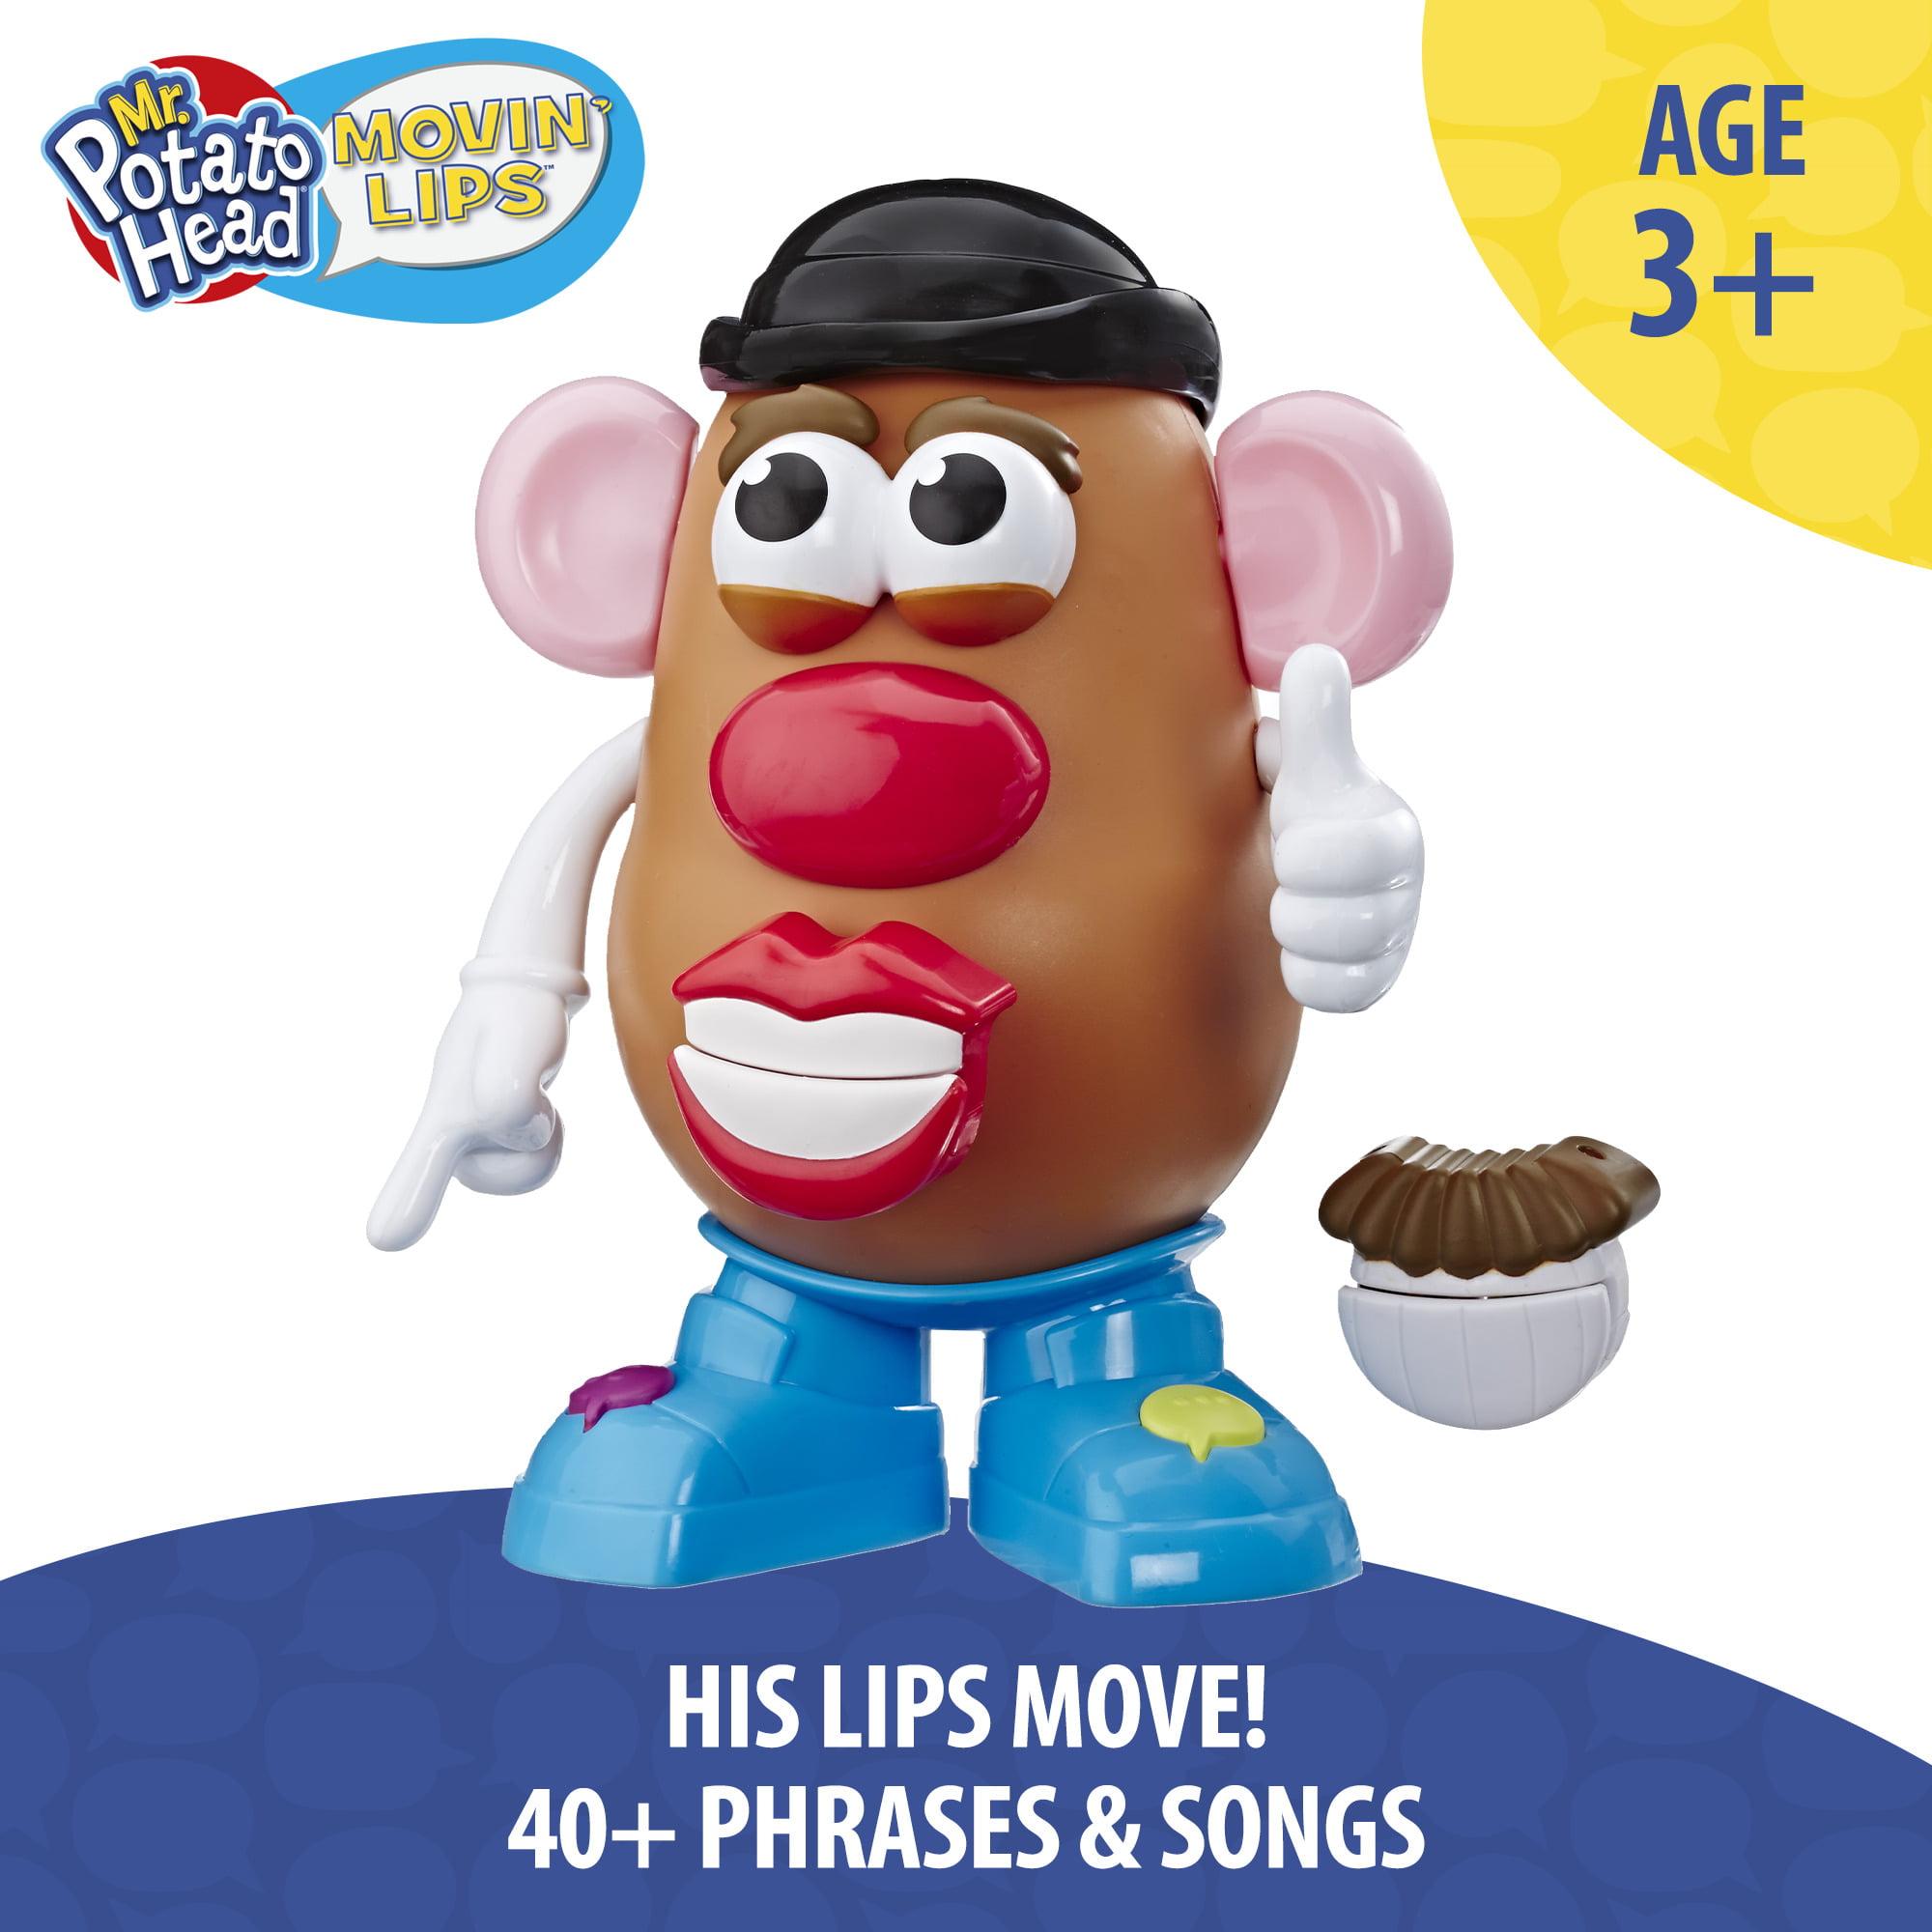 Mr Potato Head Movin Lips Electronic Interactive Talking Toy Walmart Com Walmart Com Mr nightmare fishing horror stories. mr potato head movin lips electronic interactive talking toy